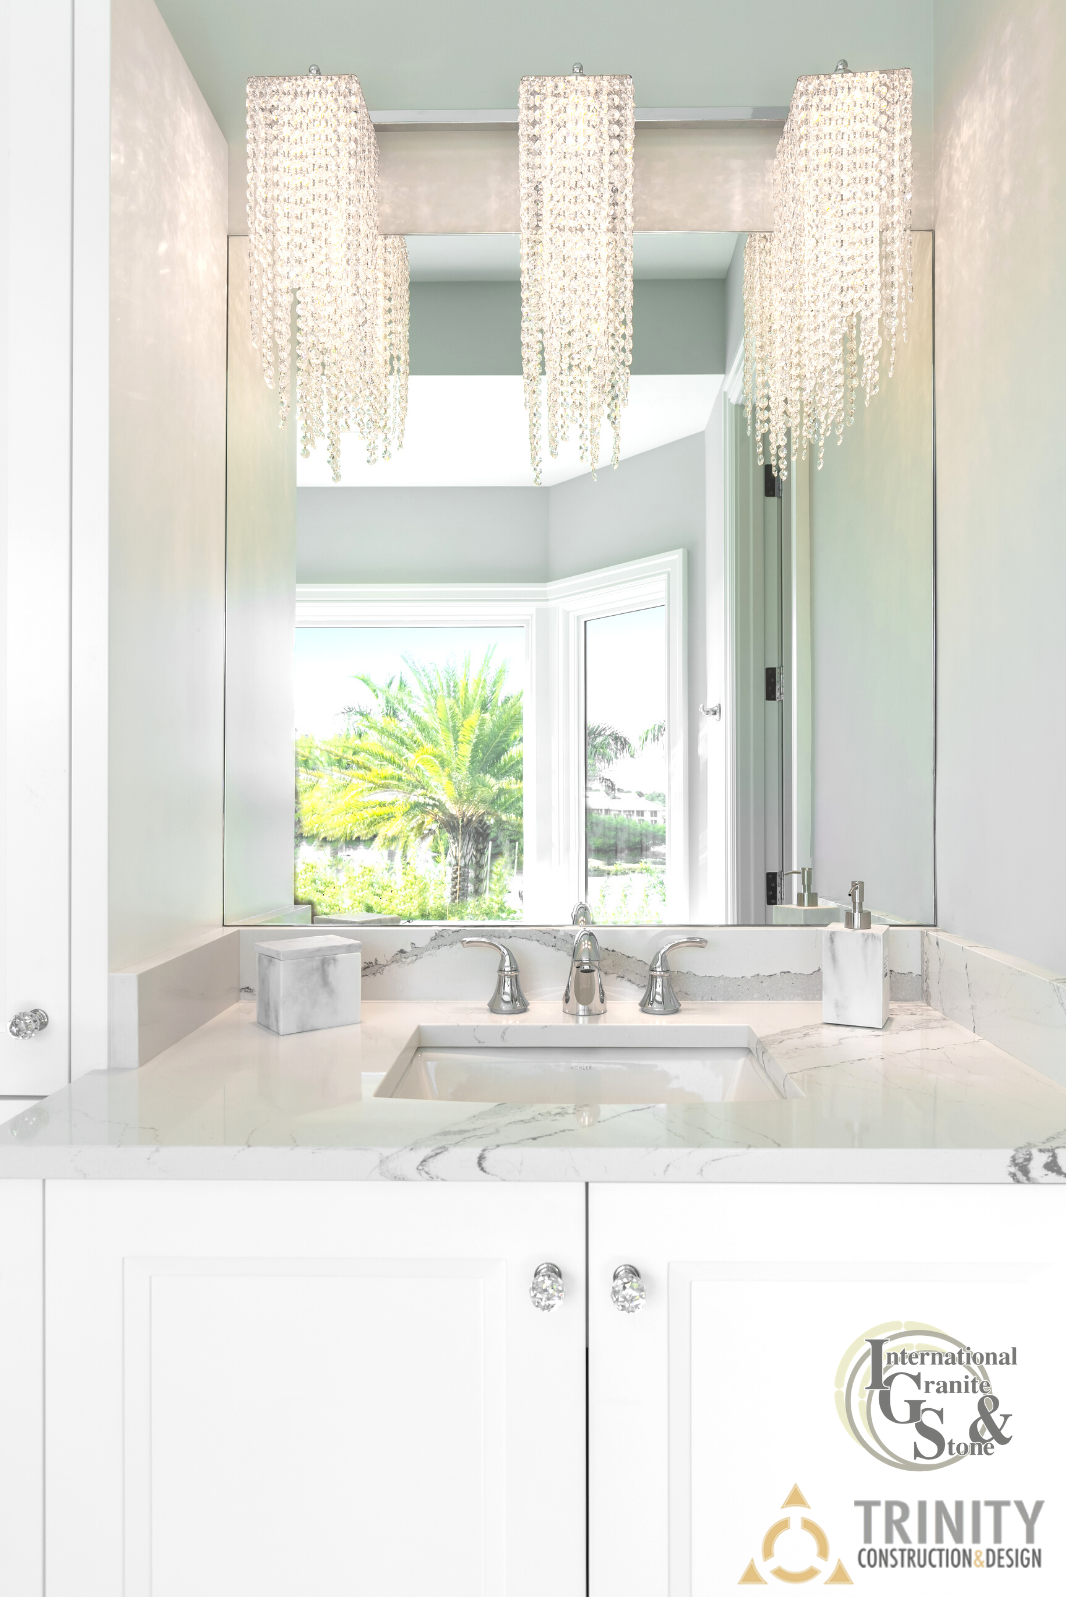 Cambria Quartz Bathroom Vanity with White Cabinets and Luxury Lighting